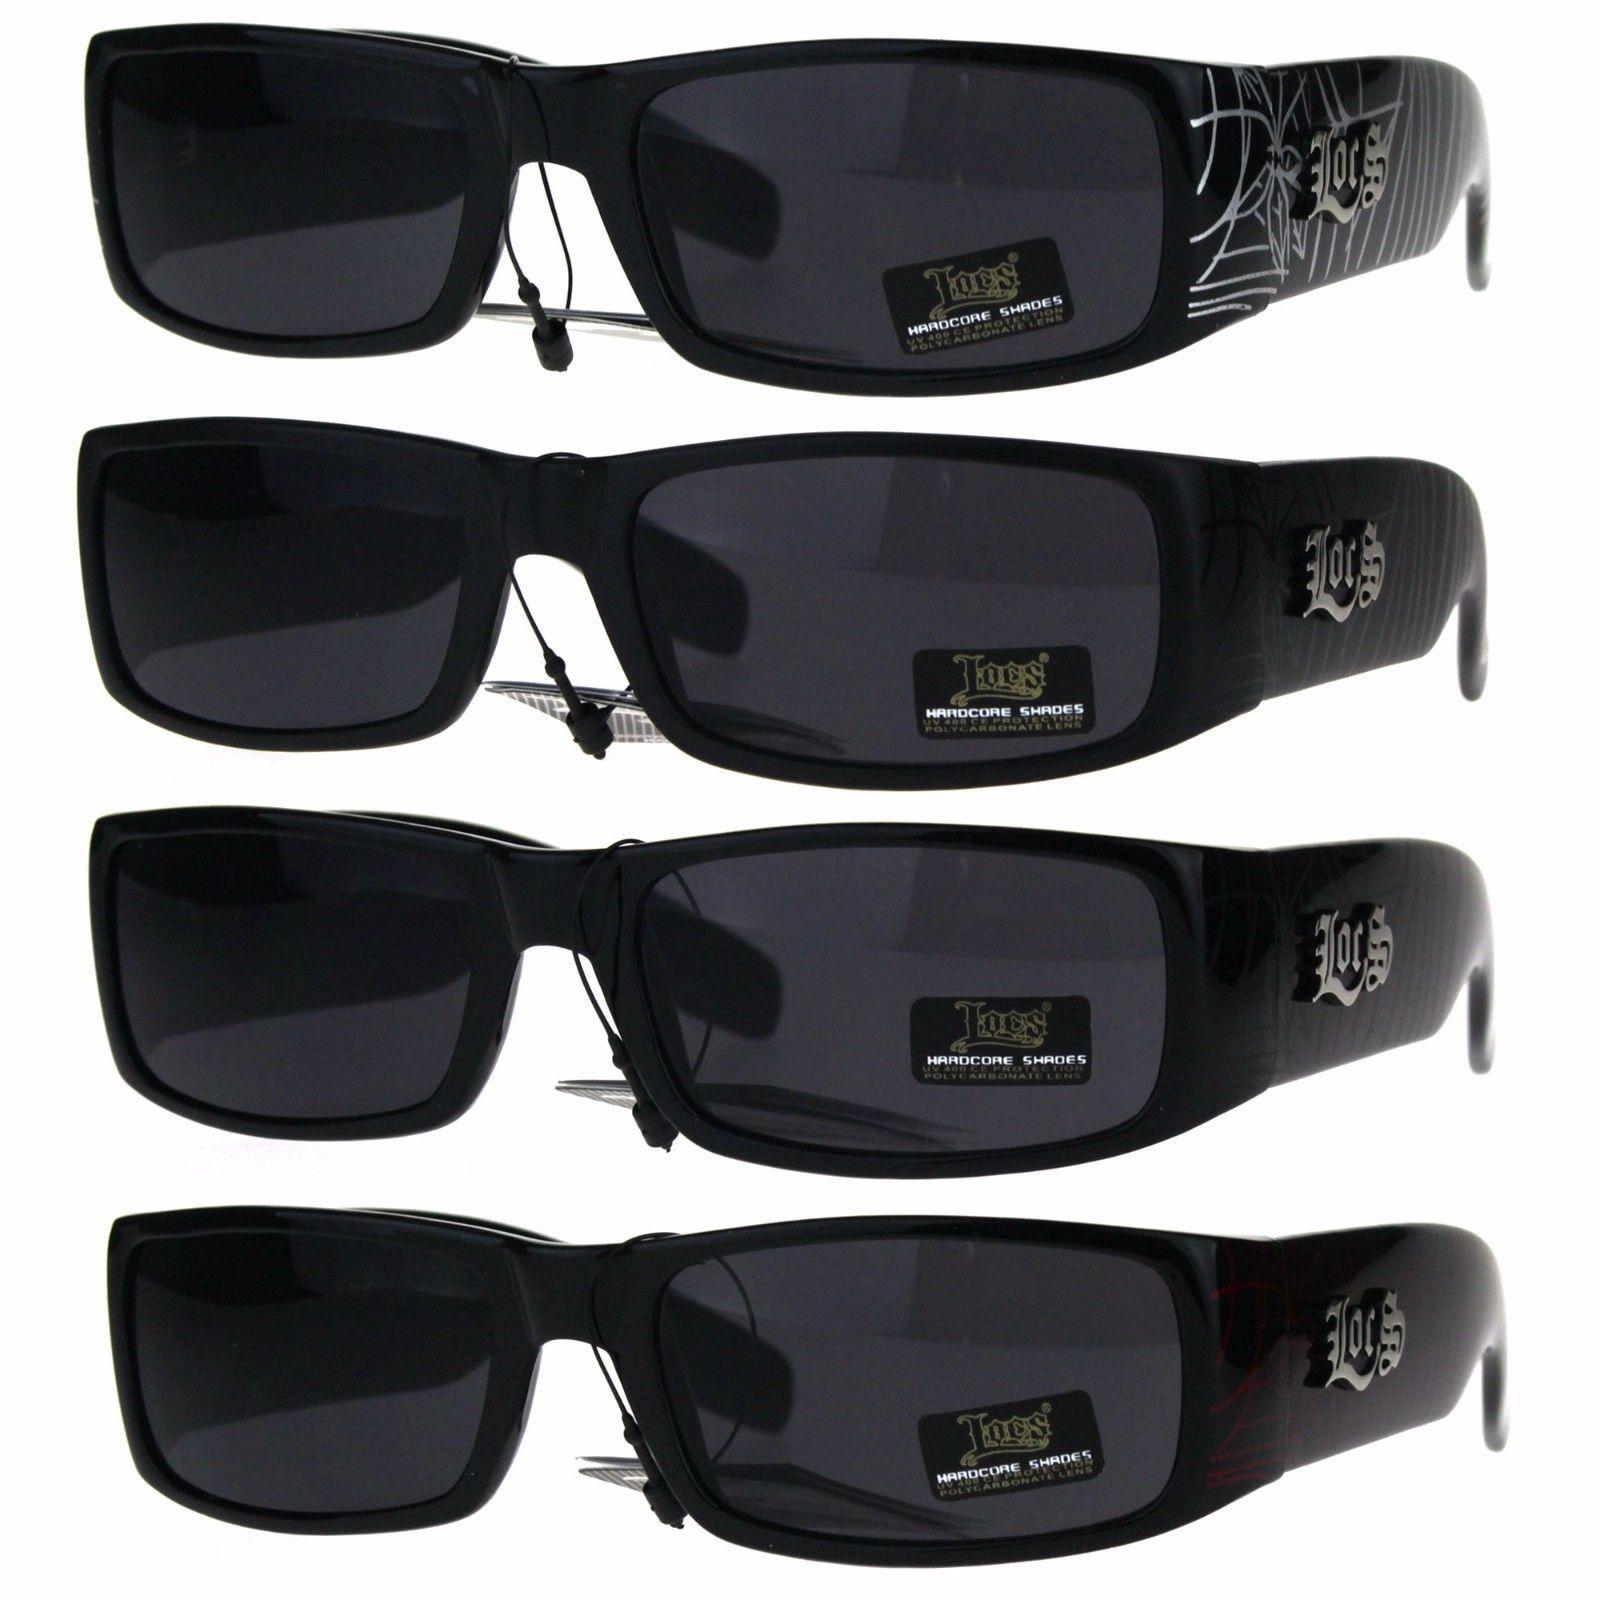 d47aa485ef9 S l1600. S l1600. Previous. Locs Narrow Rectangular Gangster Cholo Spider  Web Print Arm Sunglasses. Locs Narrow Rectangular ...